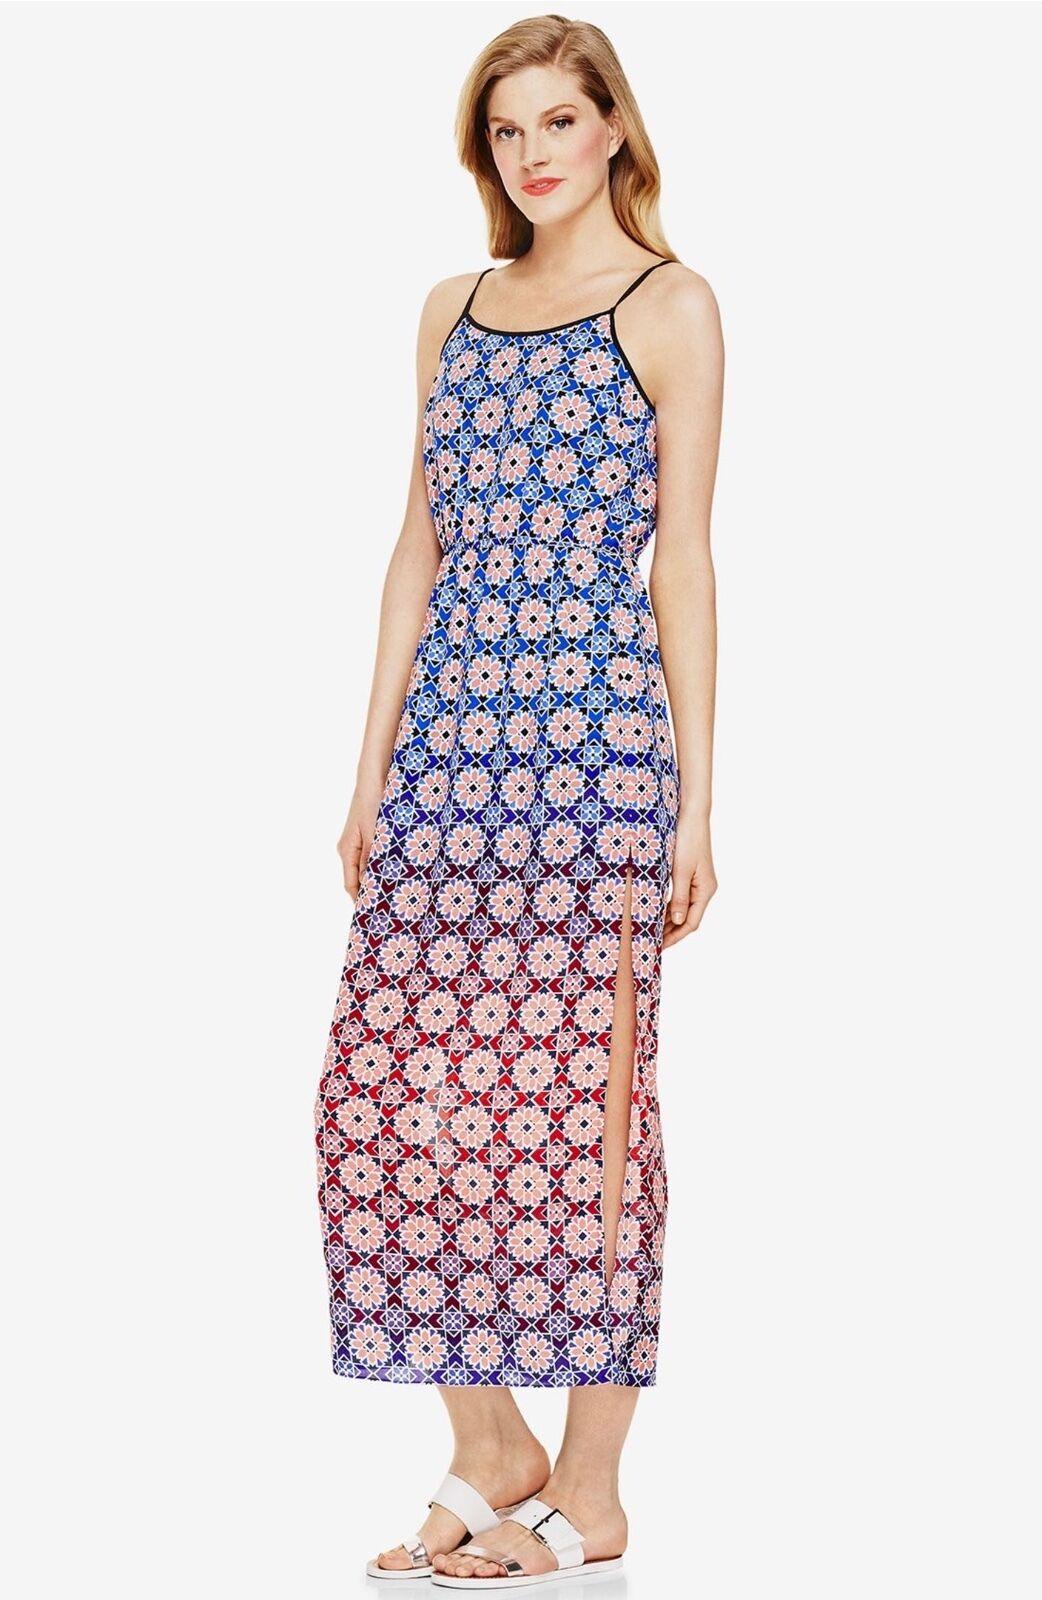 NWT   Vince Camuto 'Valencia Tile' Sleeveless Maxi Dress   SZ M   A090